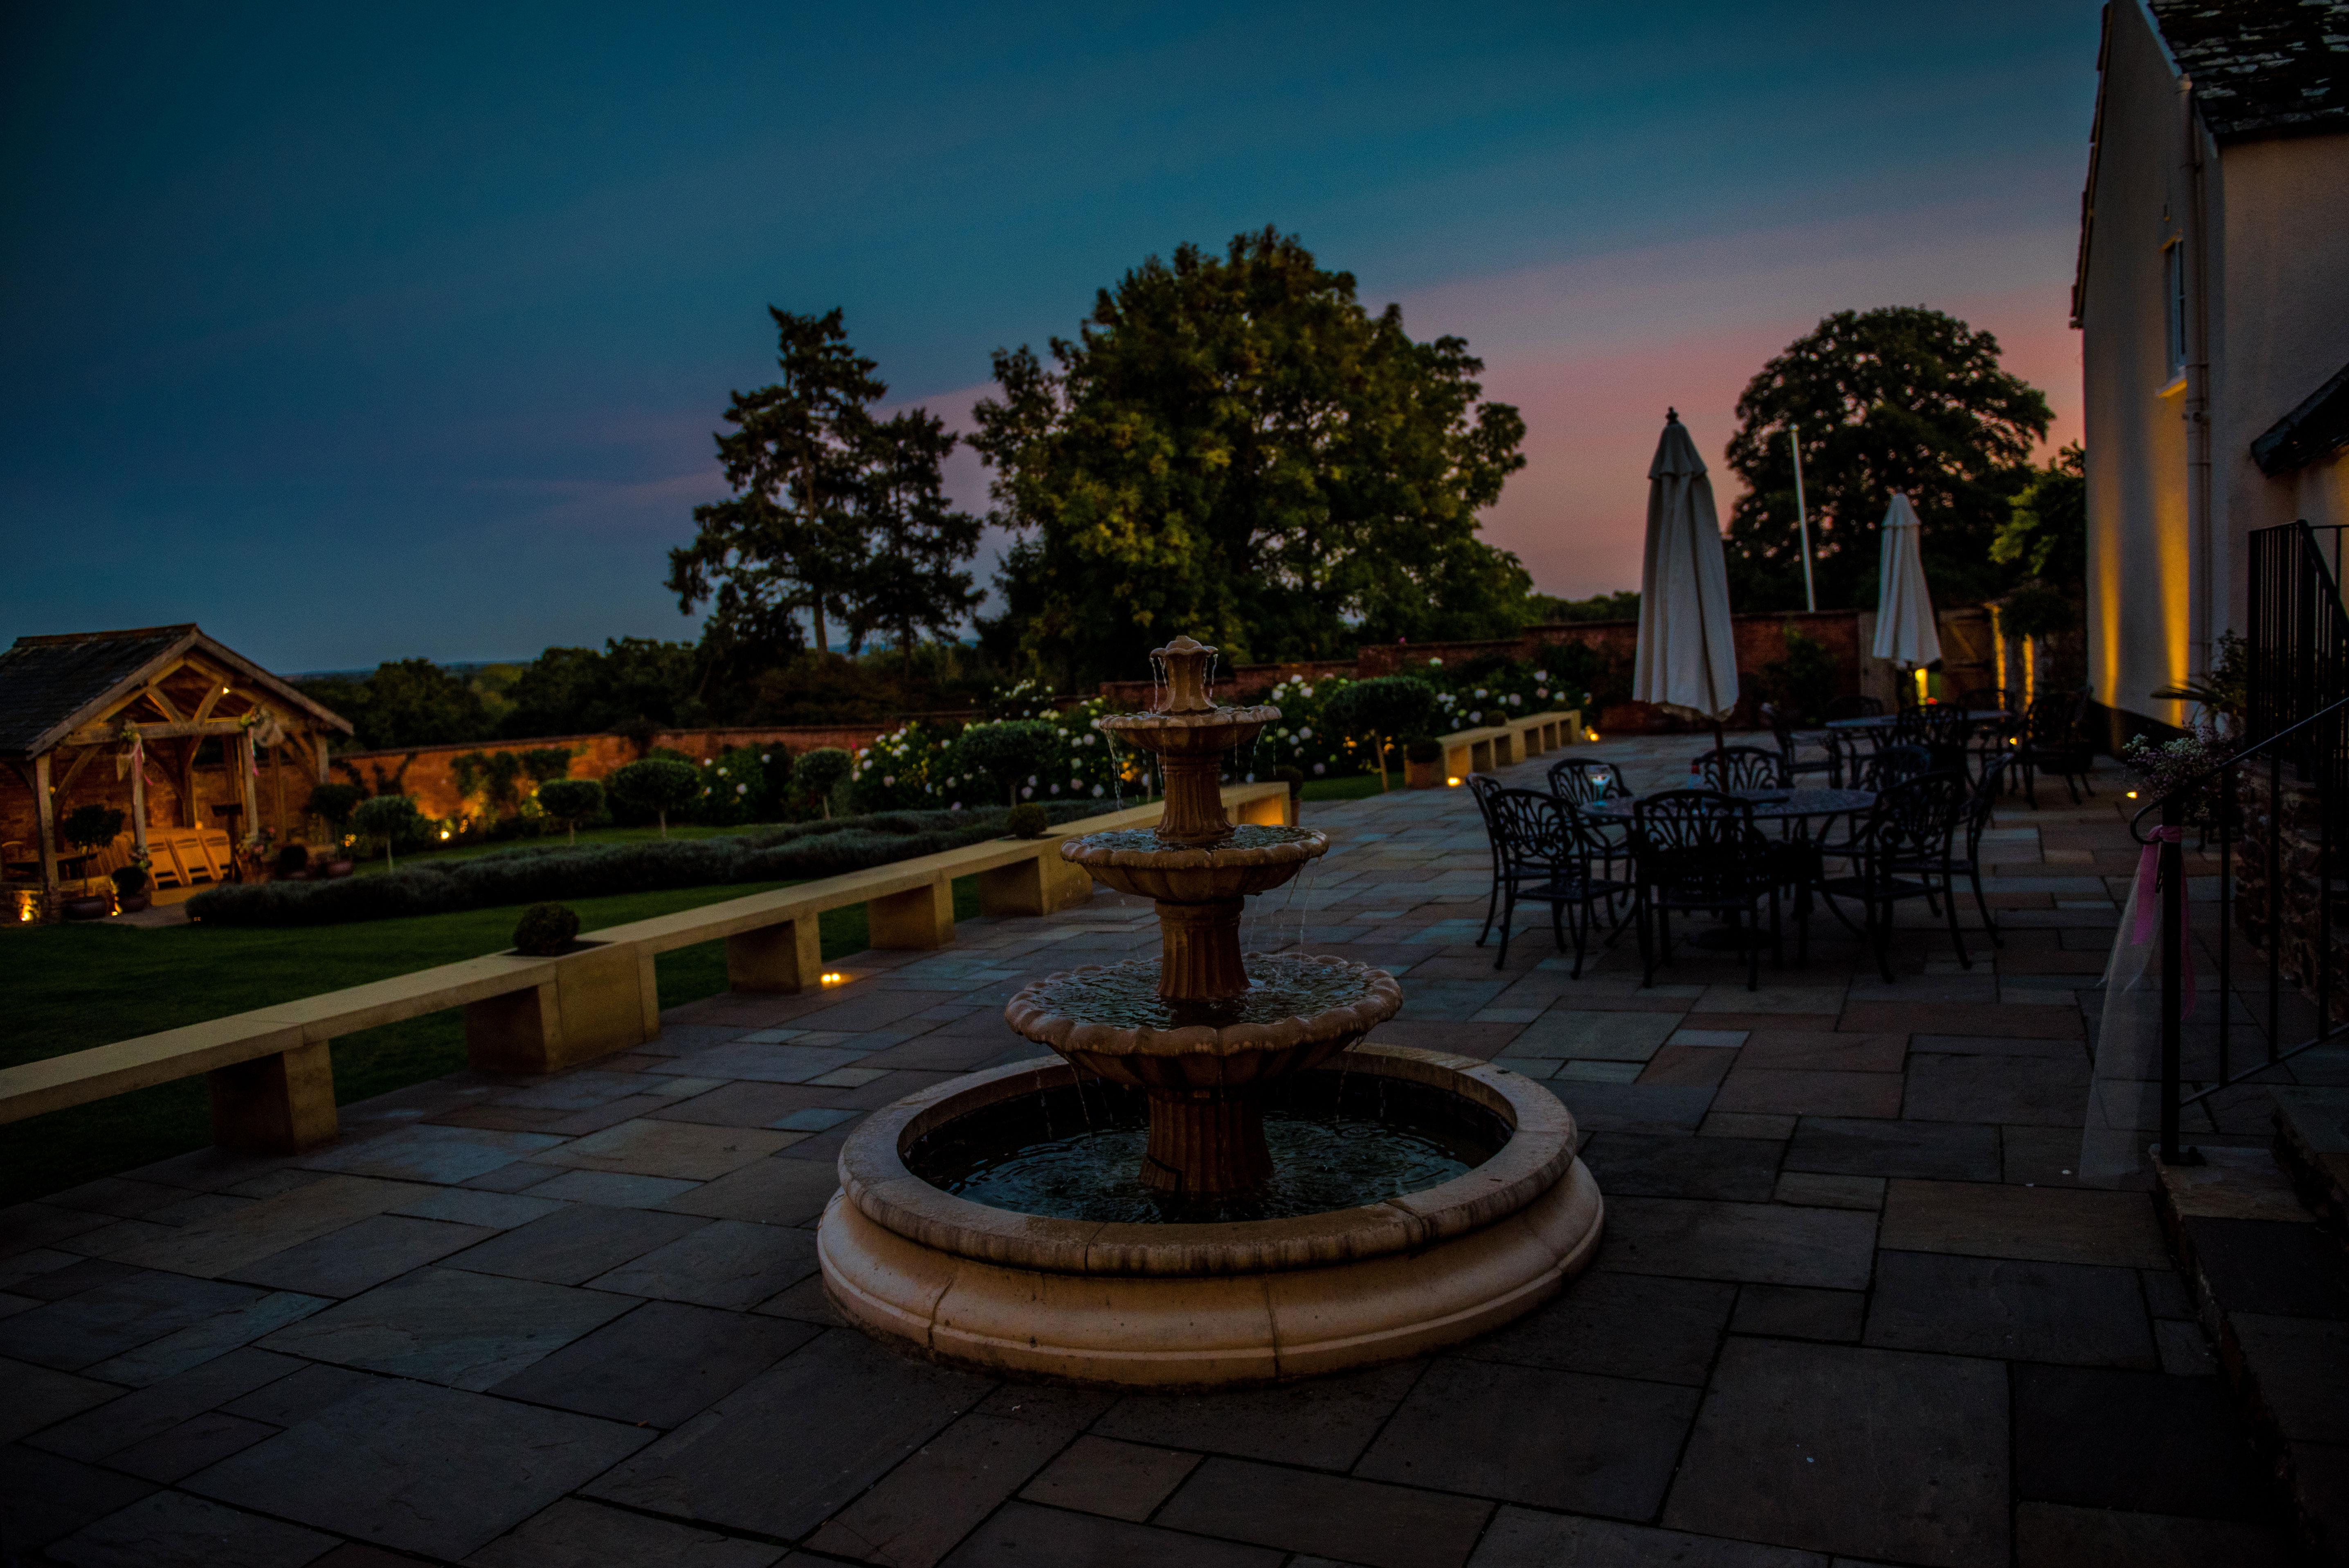 Upton Barns Walled Garden at dusk